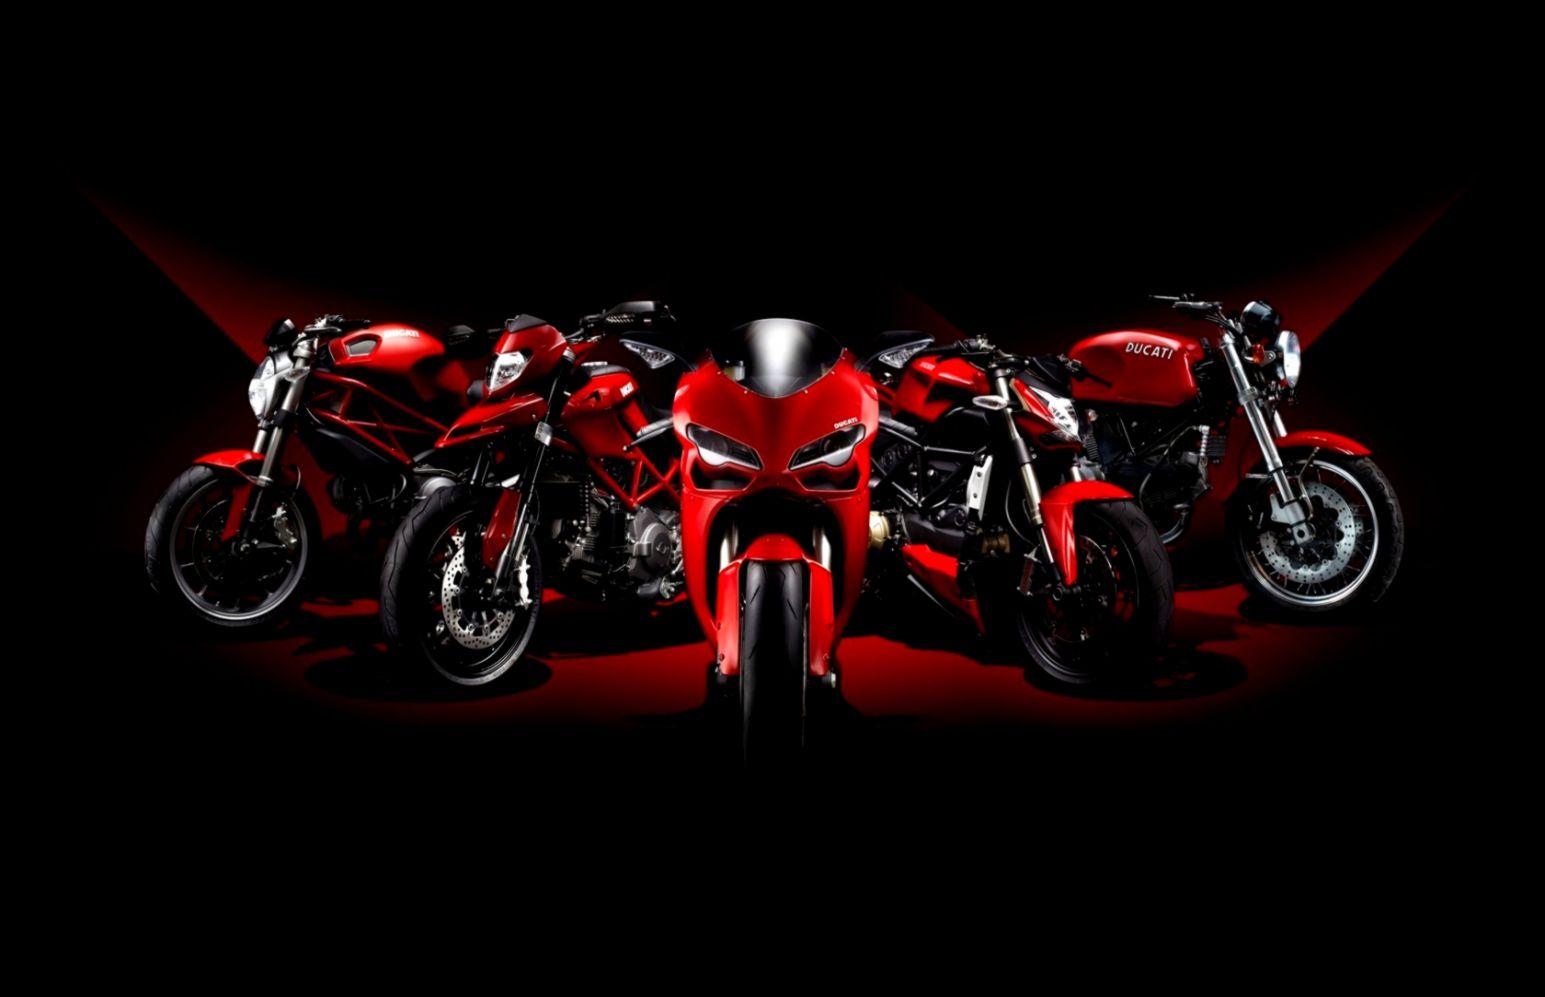 All Family Ducati Motorcycle Wallpaper HD 13741 Wallpaper  High